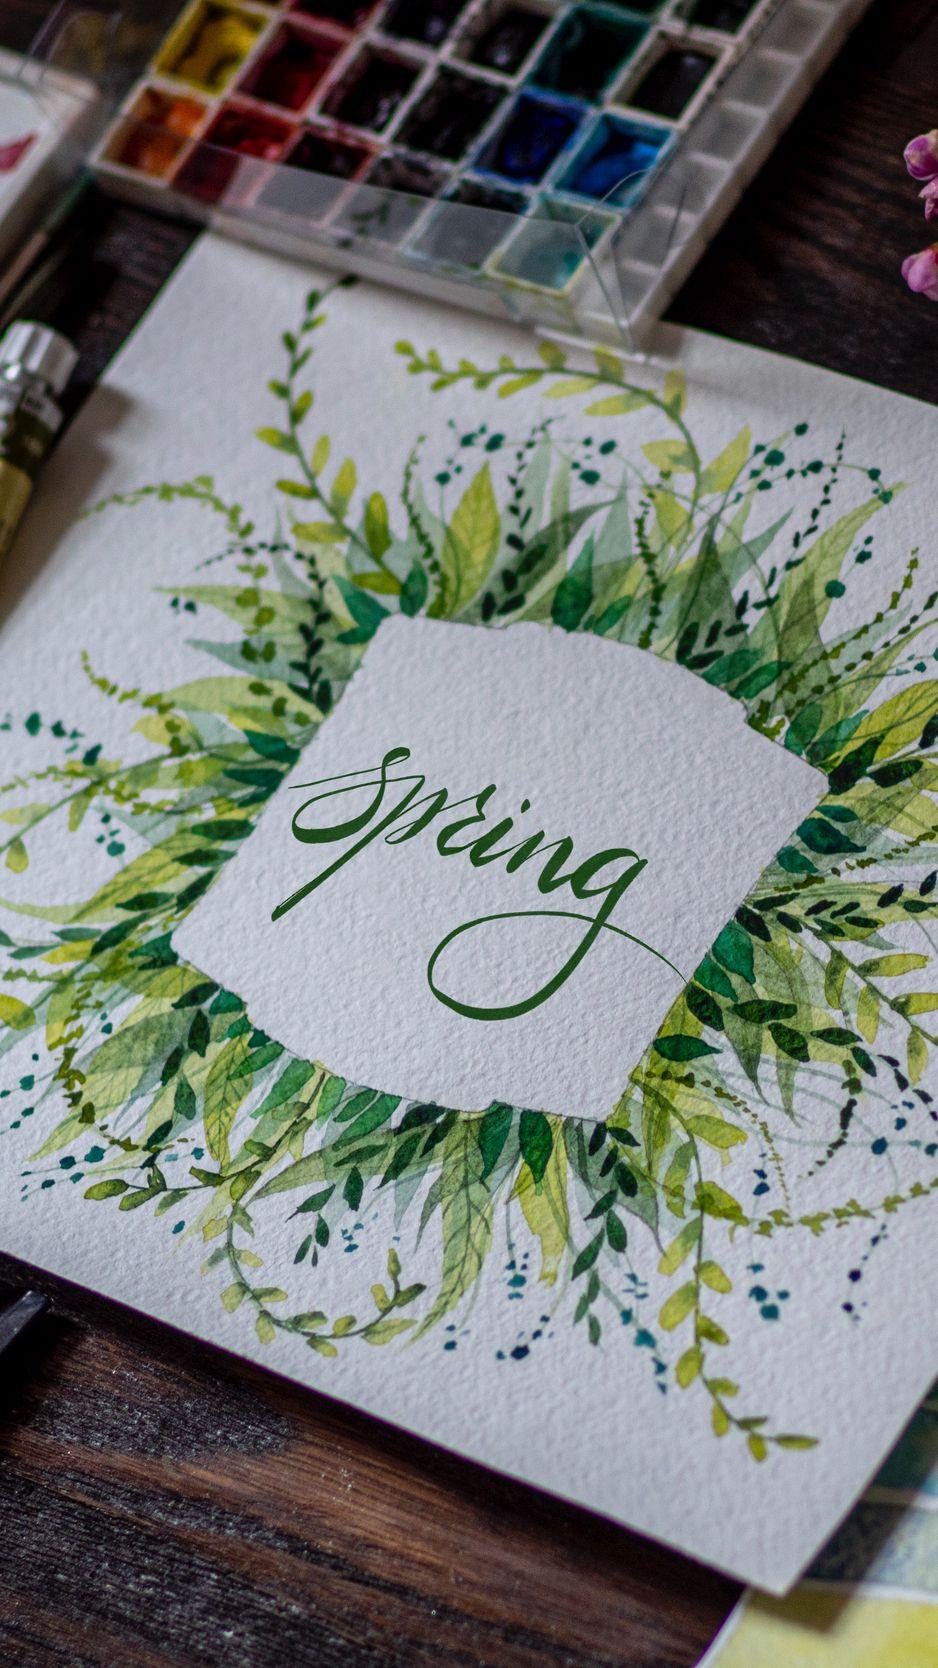 938x1668 Обои весна, слово, леттеринг, краски, акварель